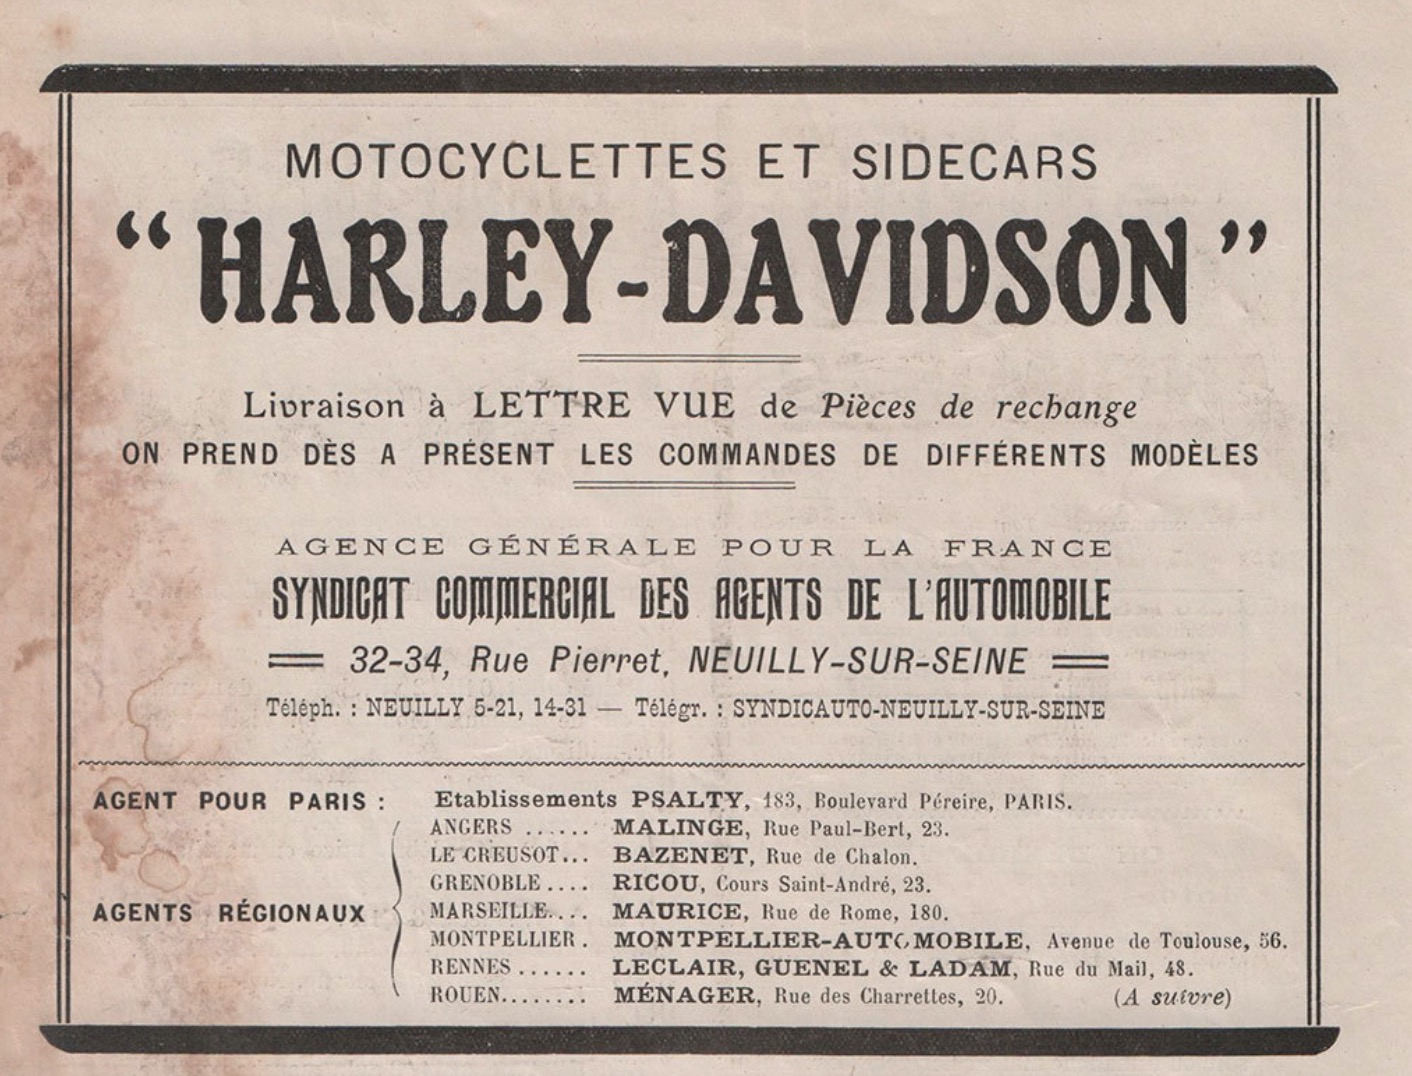 1919-harley-davidson-francia